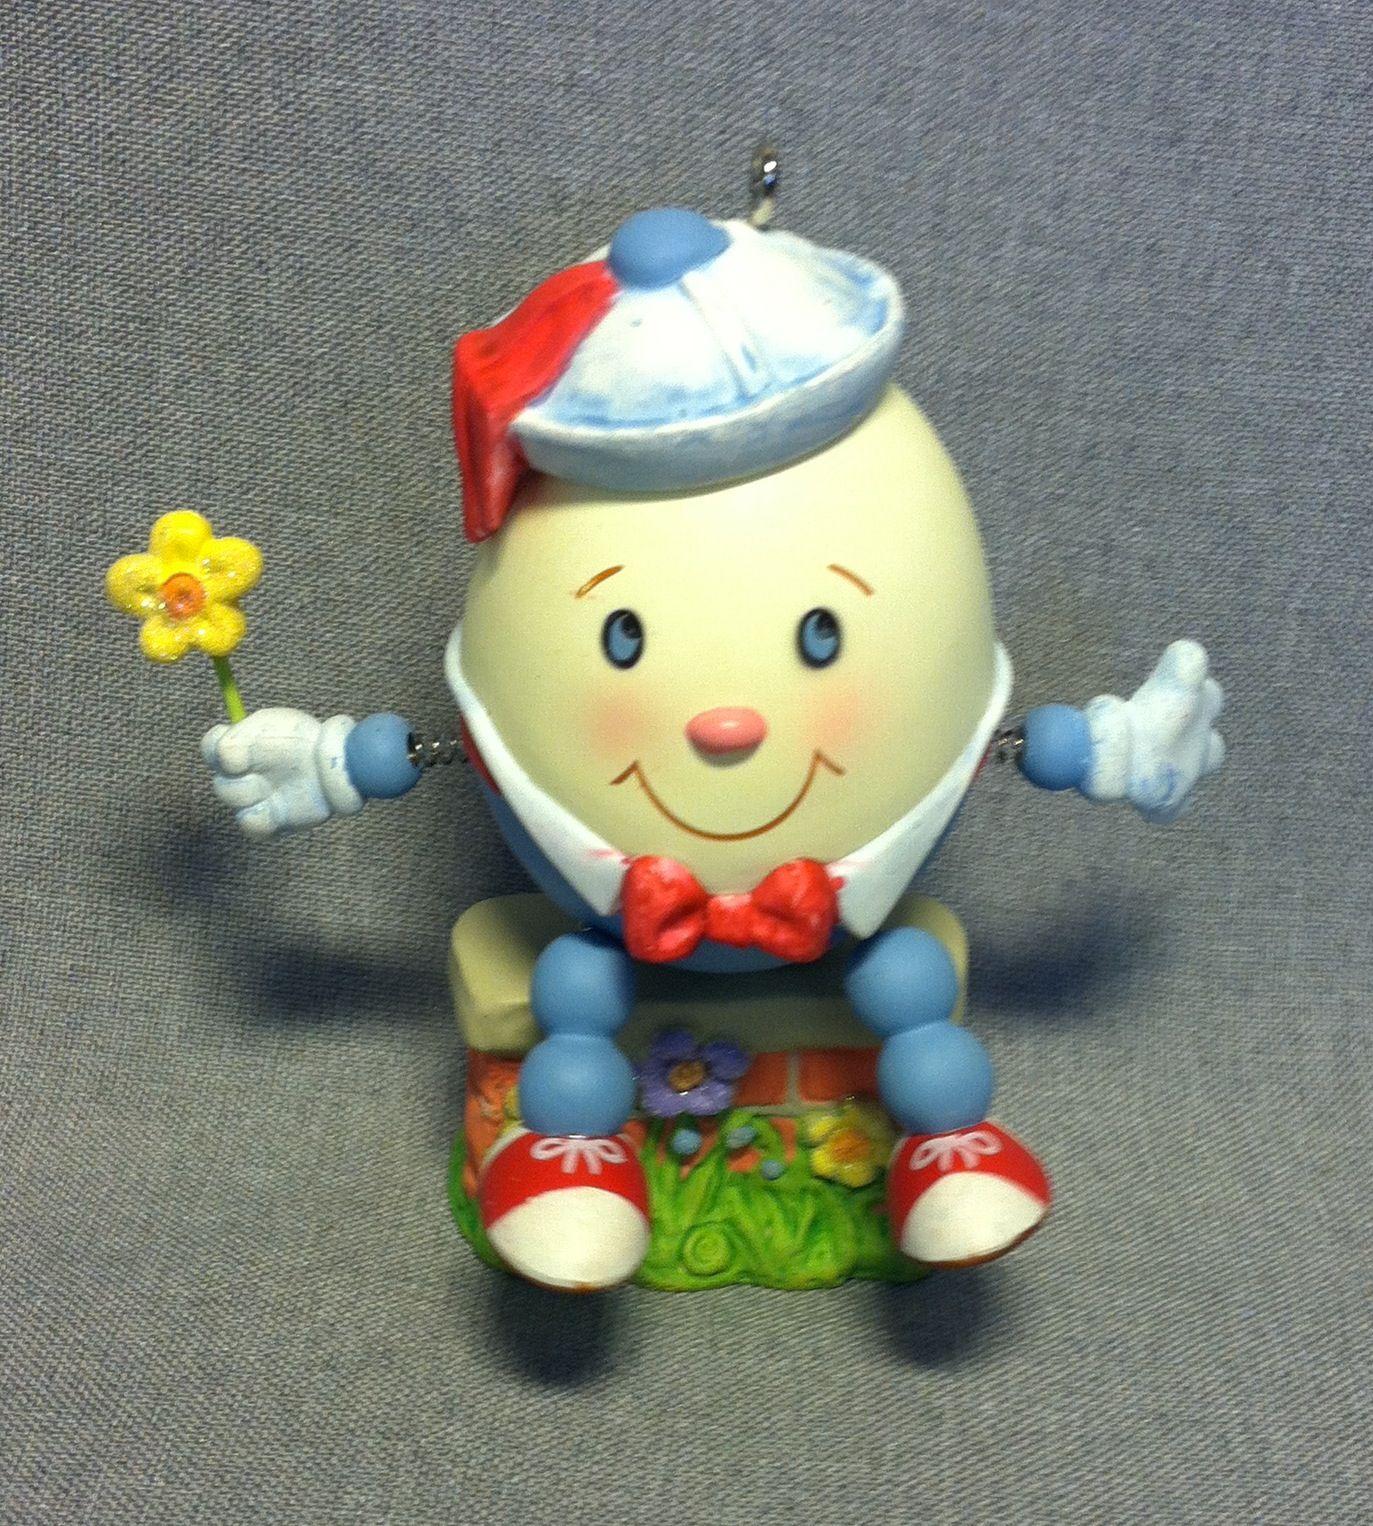 Humpty Dumpty Hallmark 2009 Hallmark ornaments